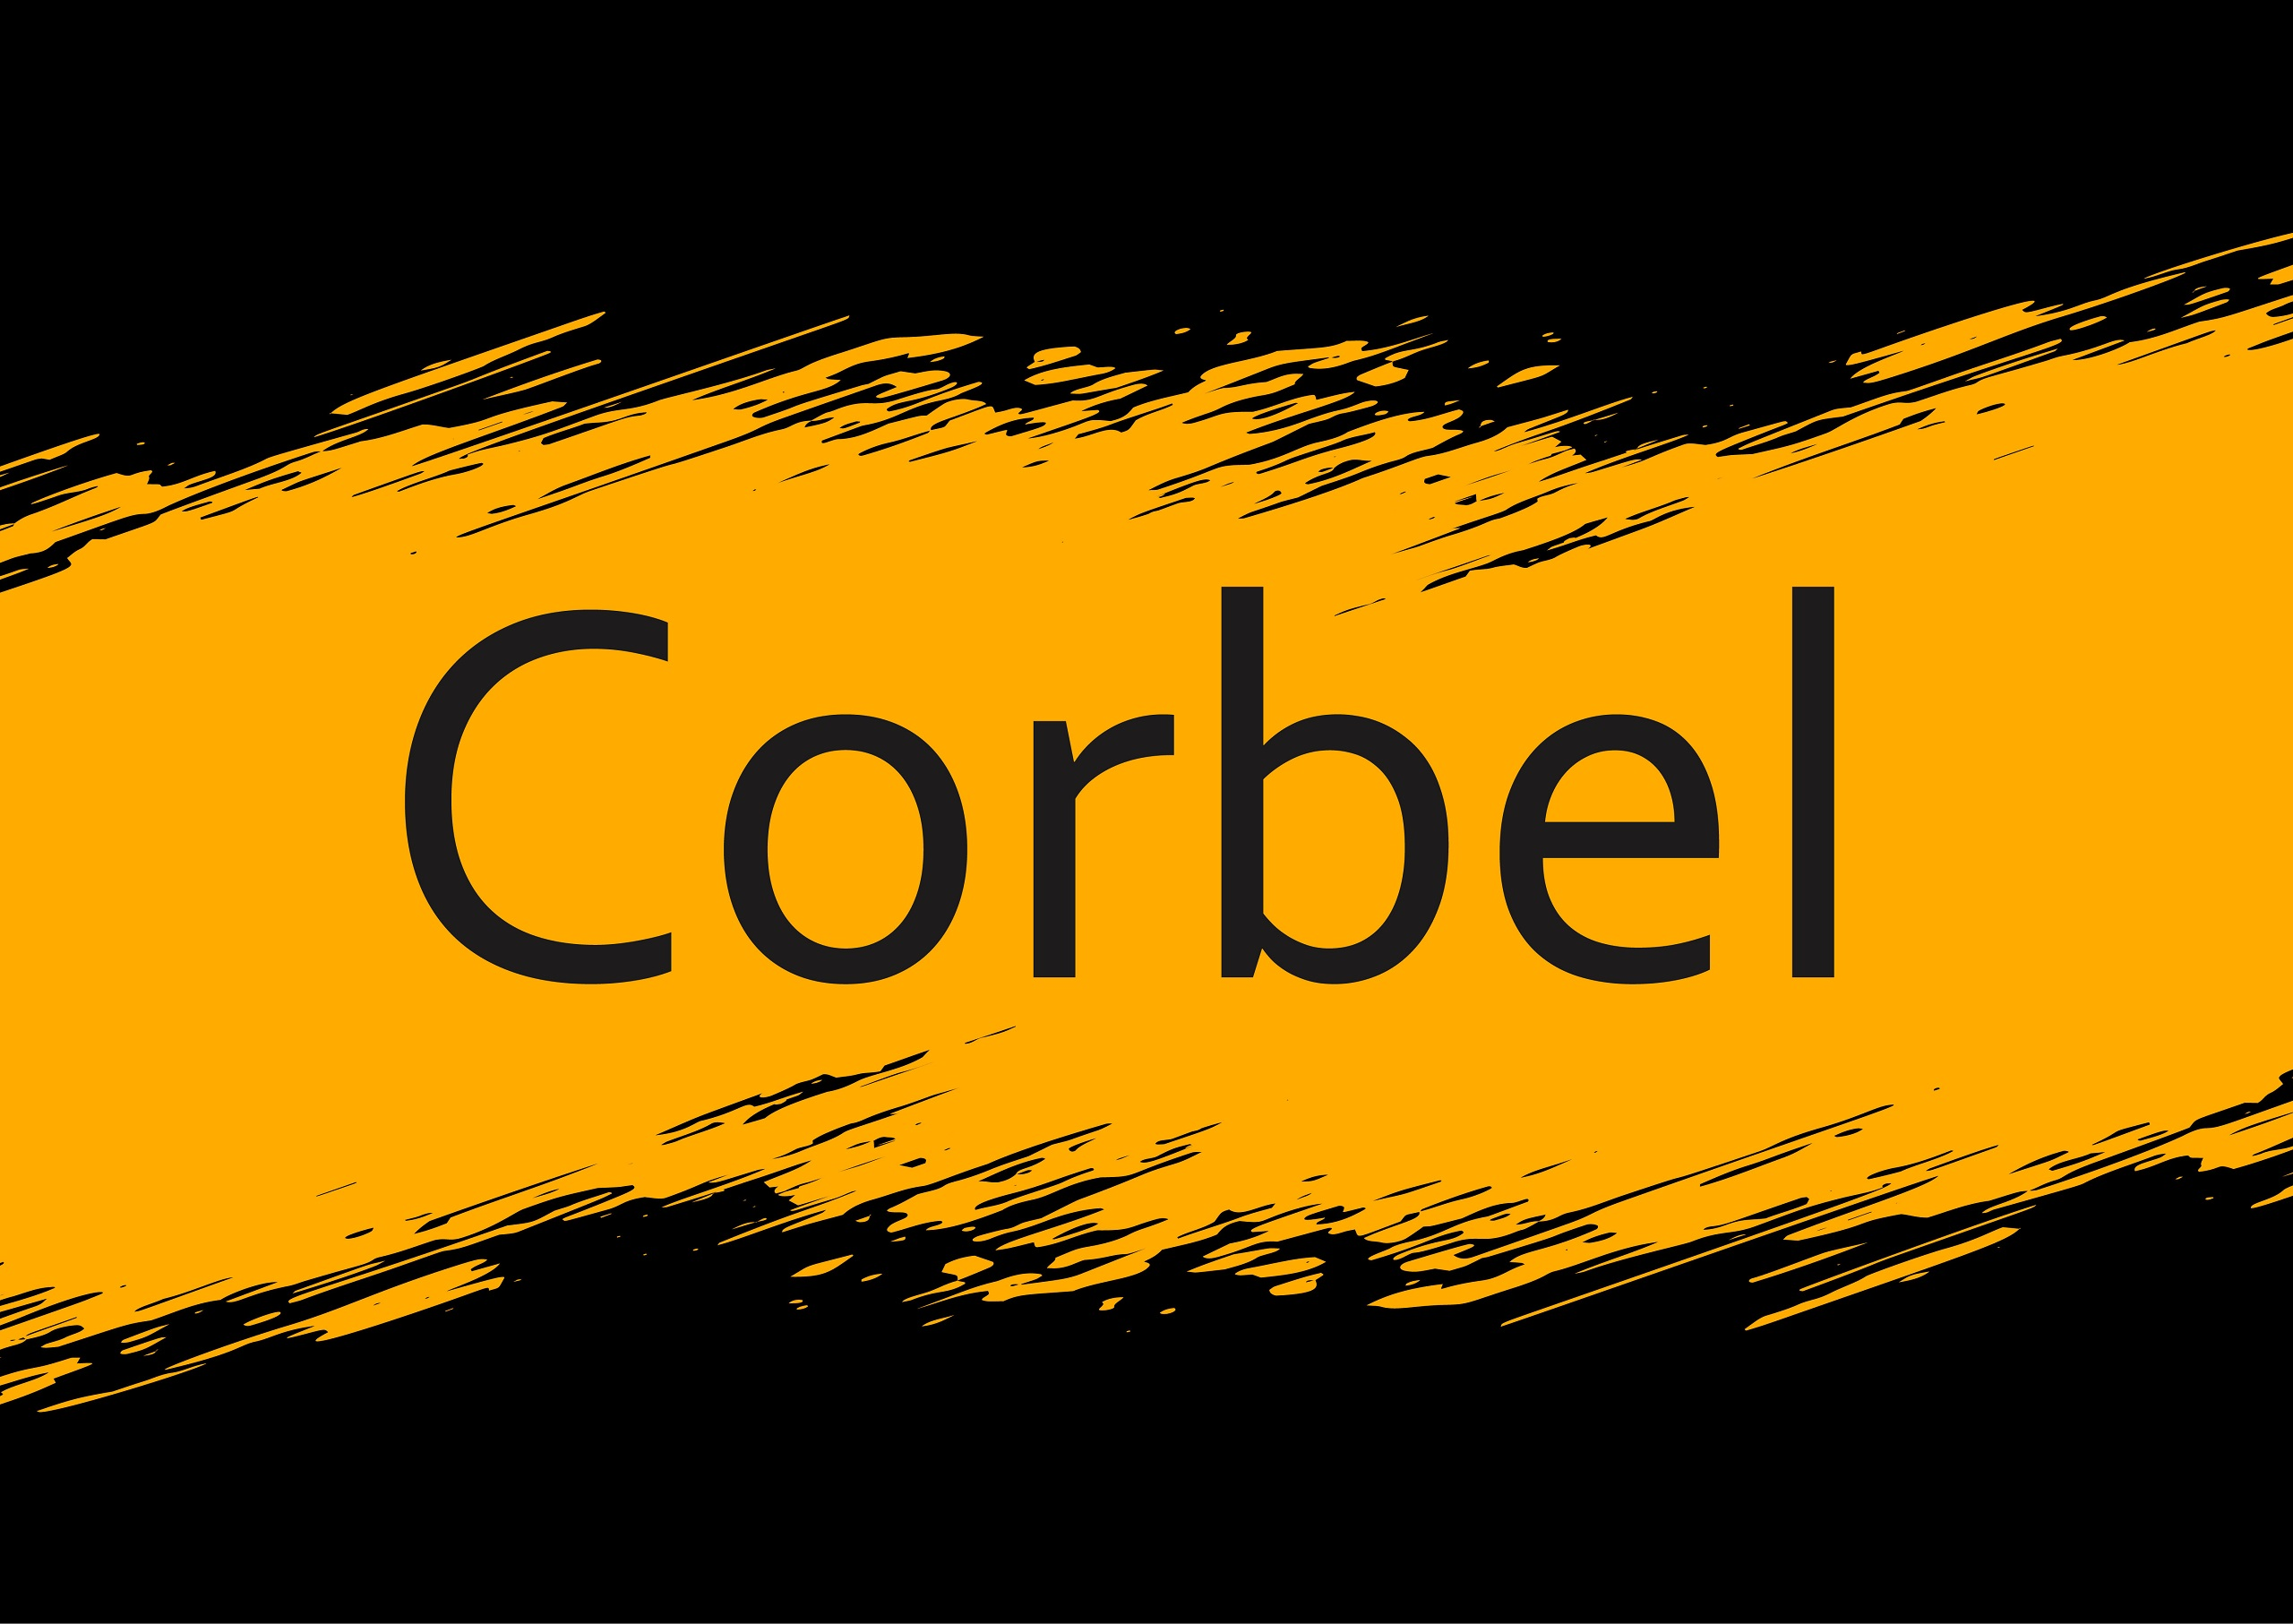 Corbel Sans Serif Typeface -1